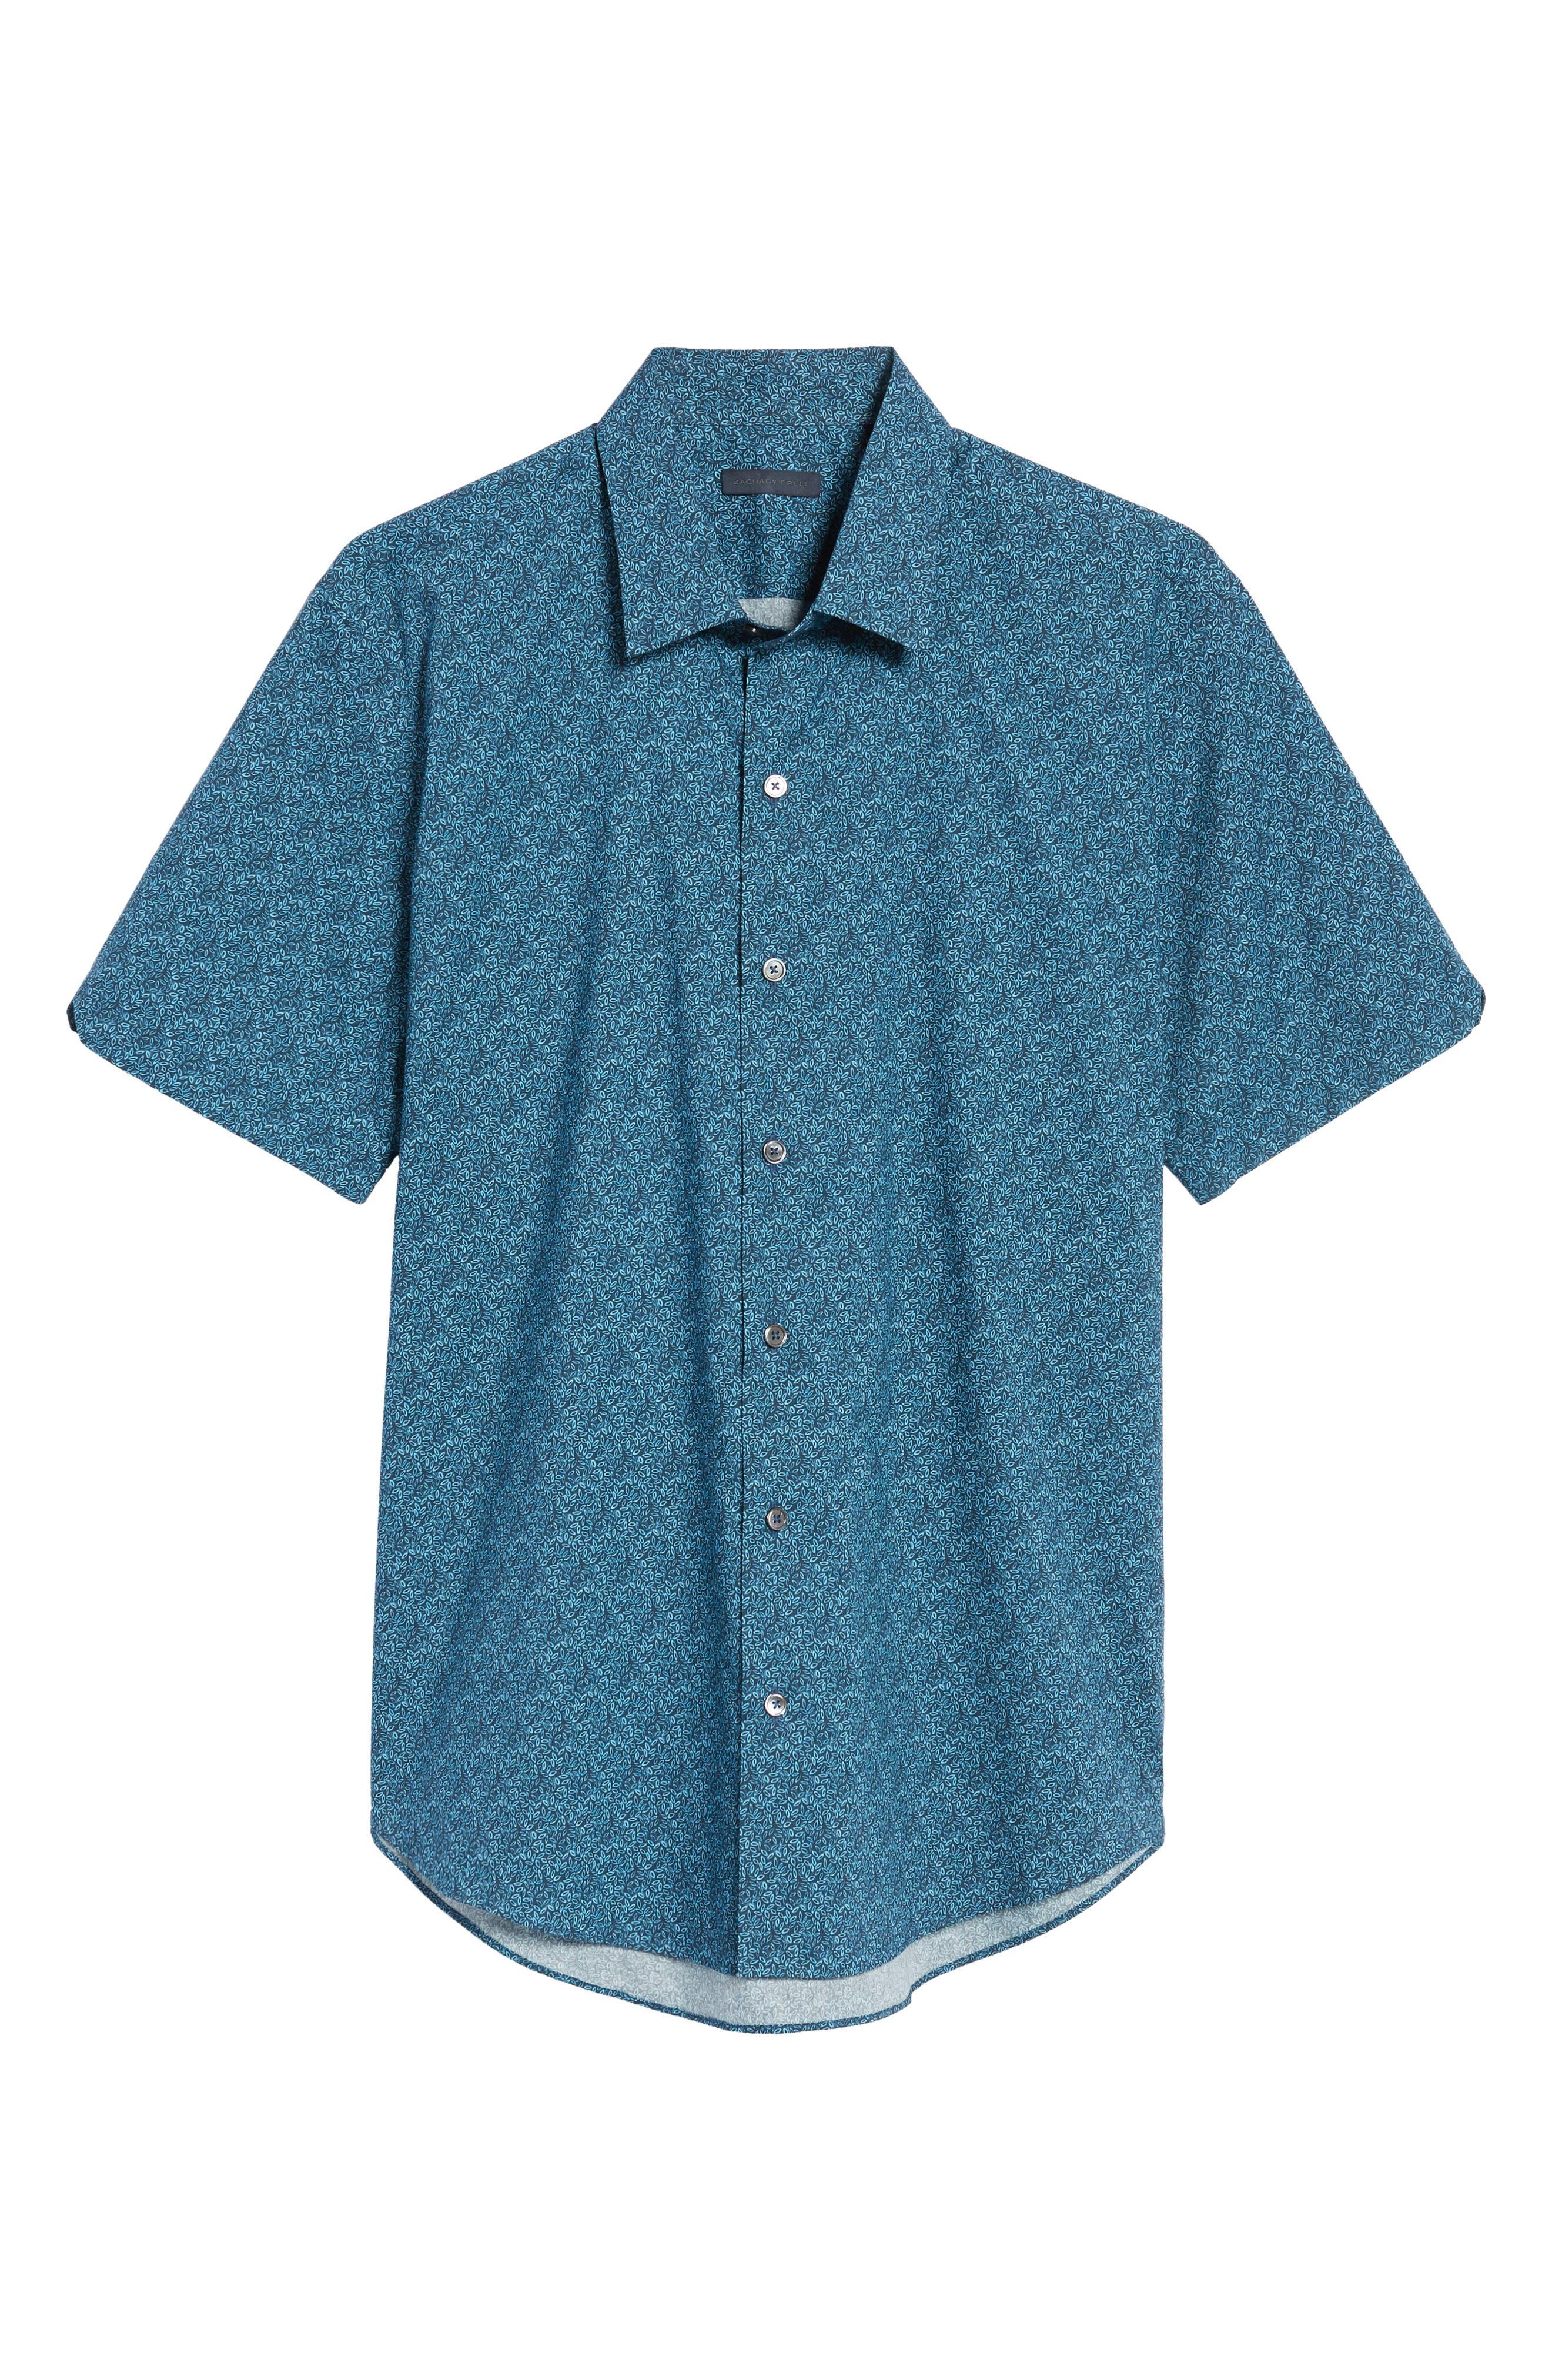 Machnee Slim Fit Print Sport Shirt,                             Alternate thumbnail 6, color,                             401